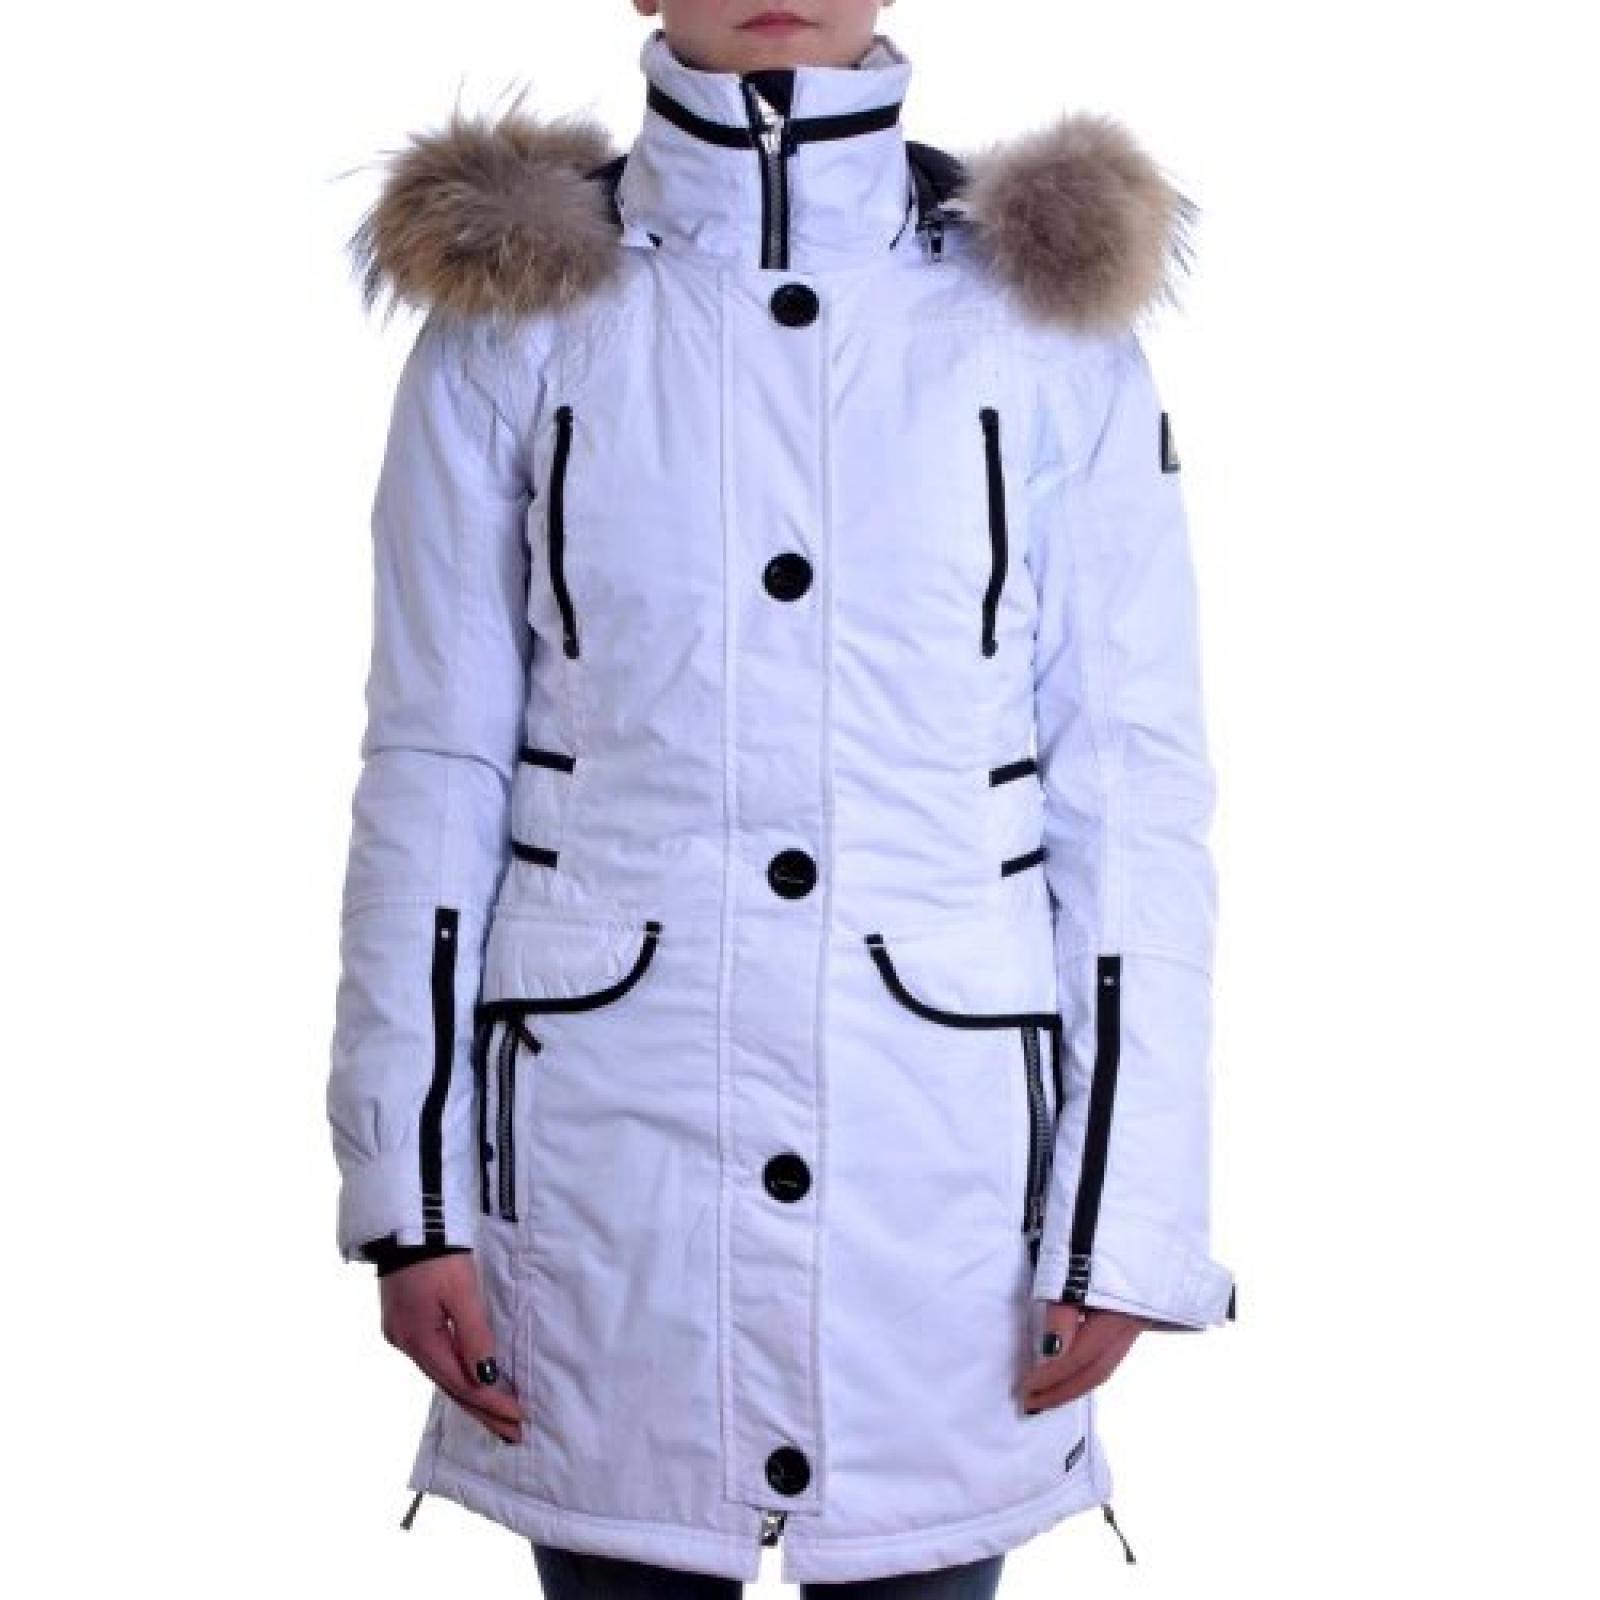 Gaastra Damenjacke Dovetail Gr. XXL UVP 369,95 Euro 36112522 Weiß Damen Jacke